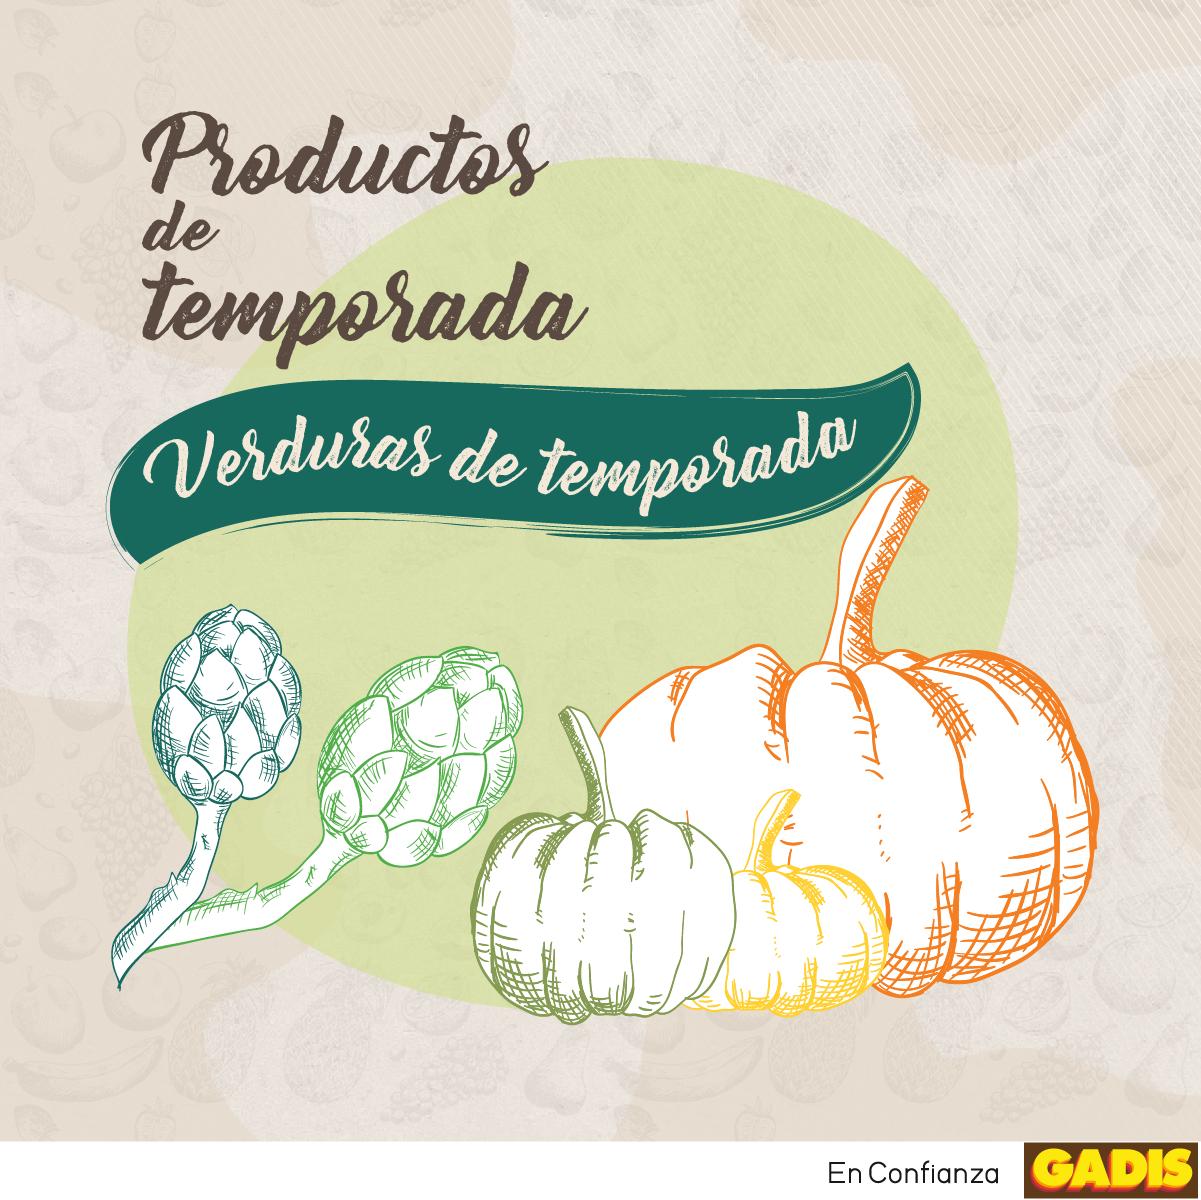 Â¡Descubre las verduras de temporada!